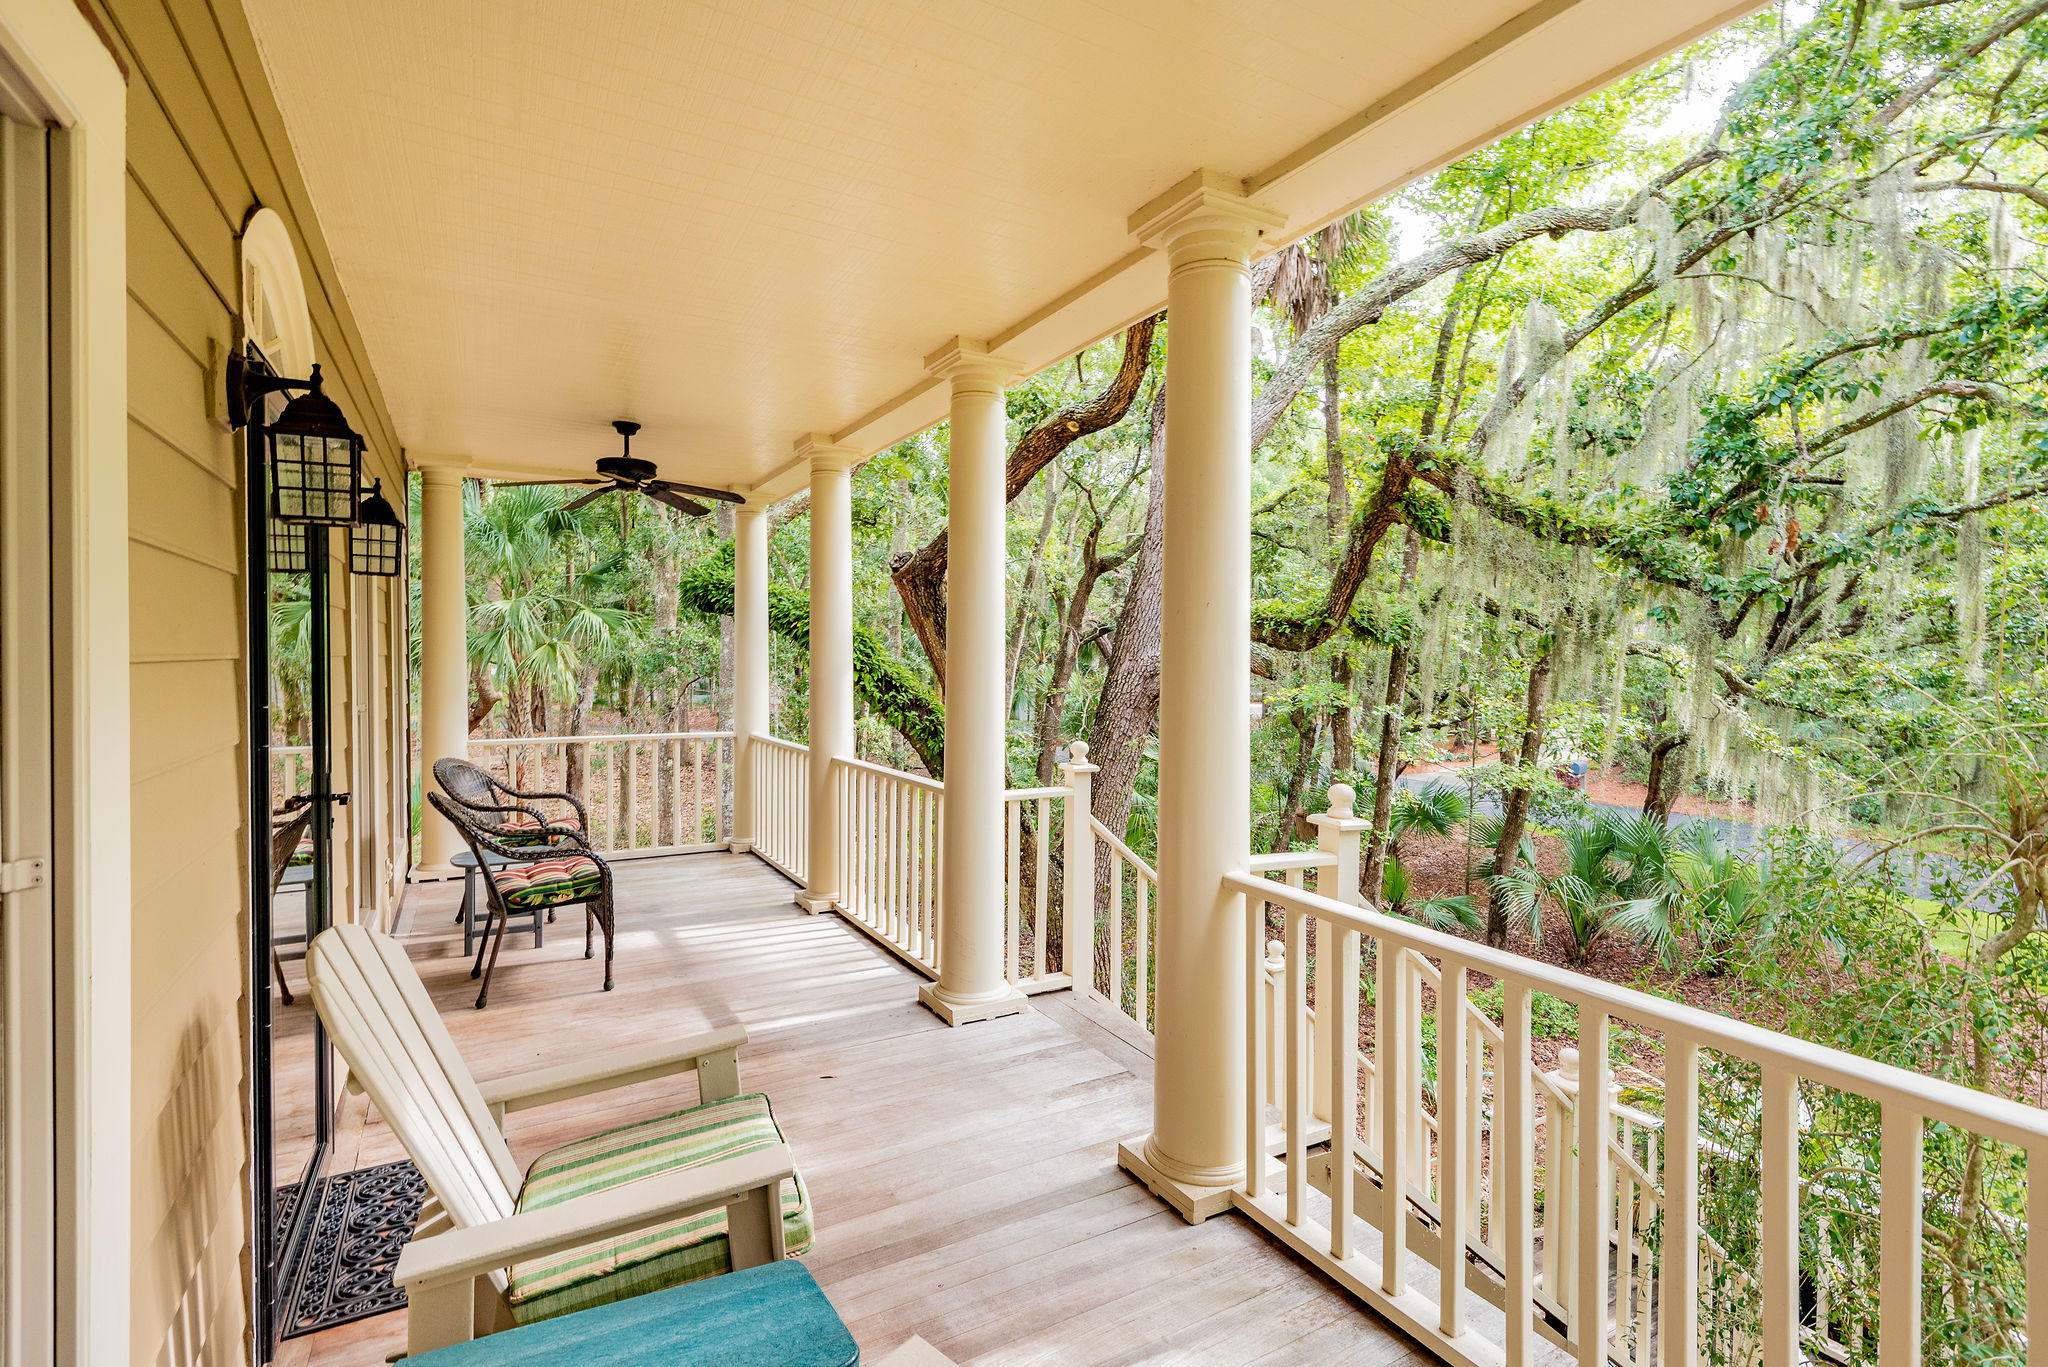 Kiawah Island Homes For Sale - 134 Conifer, Kiawah Island, SC - 11